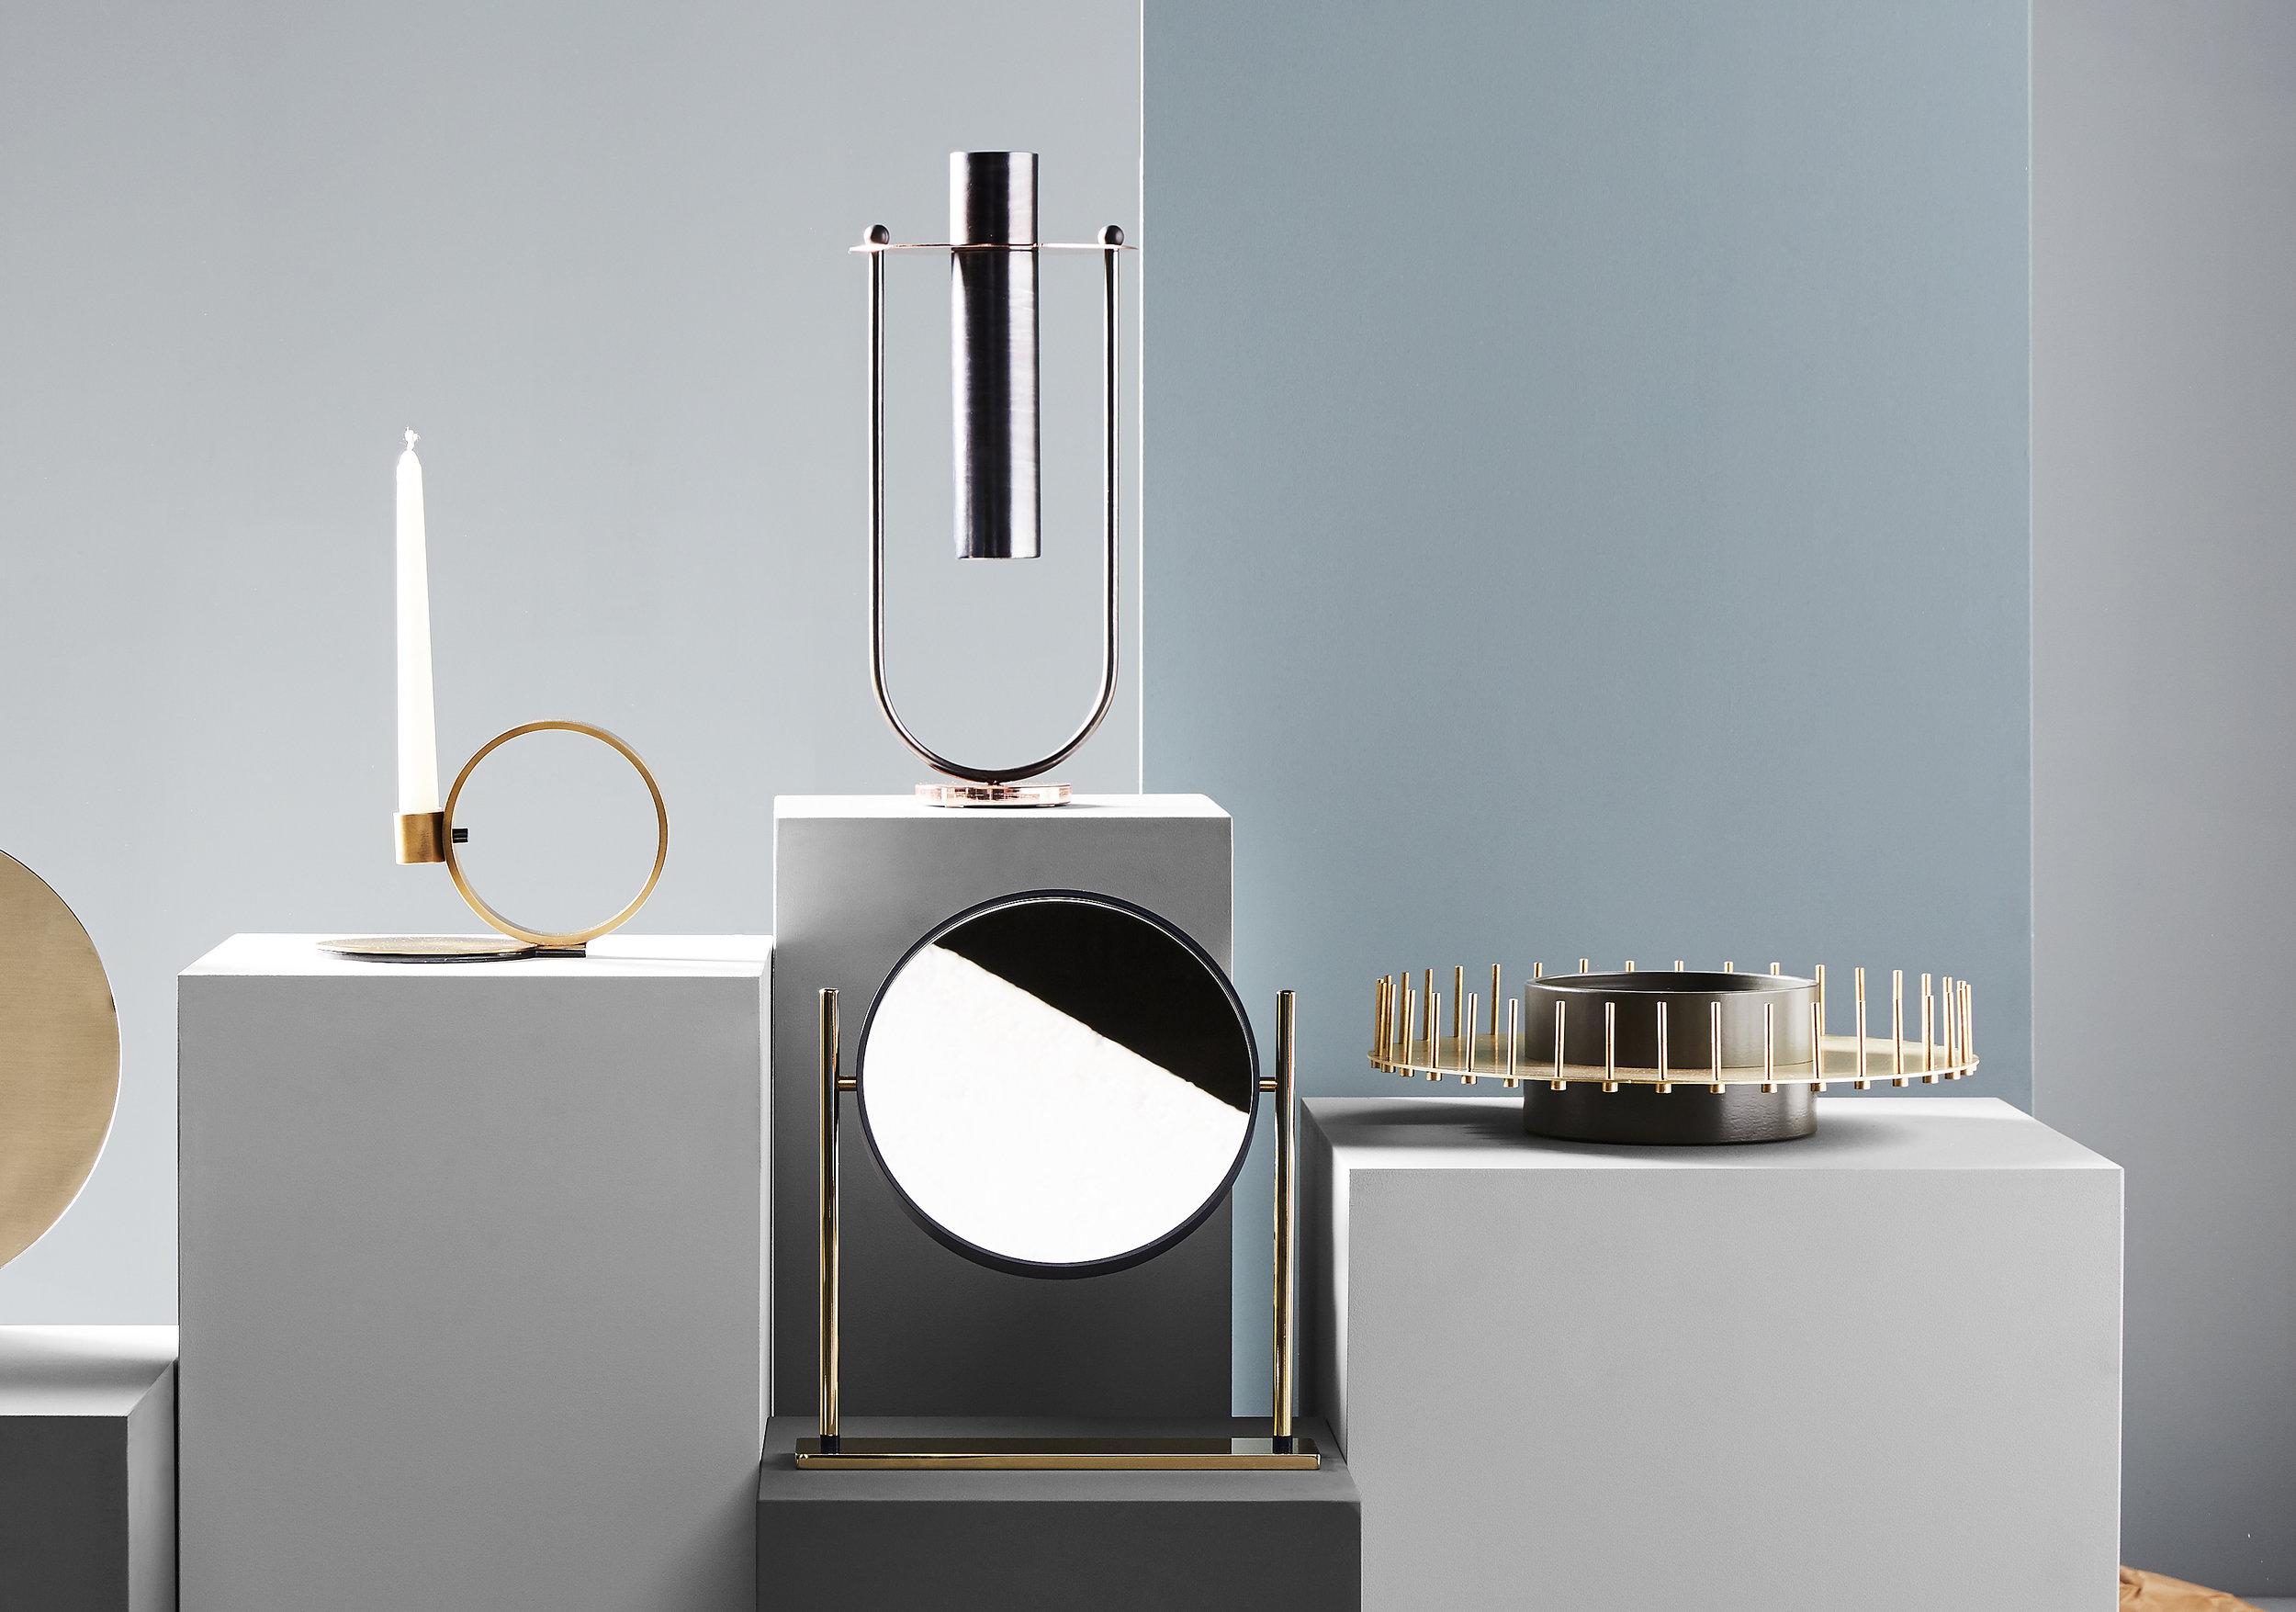 Elletra  Vase and  Mirrò  mirror designed for  Mingardo  on display at Maison&Objet, January 2018 ©  Maison&Objet